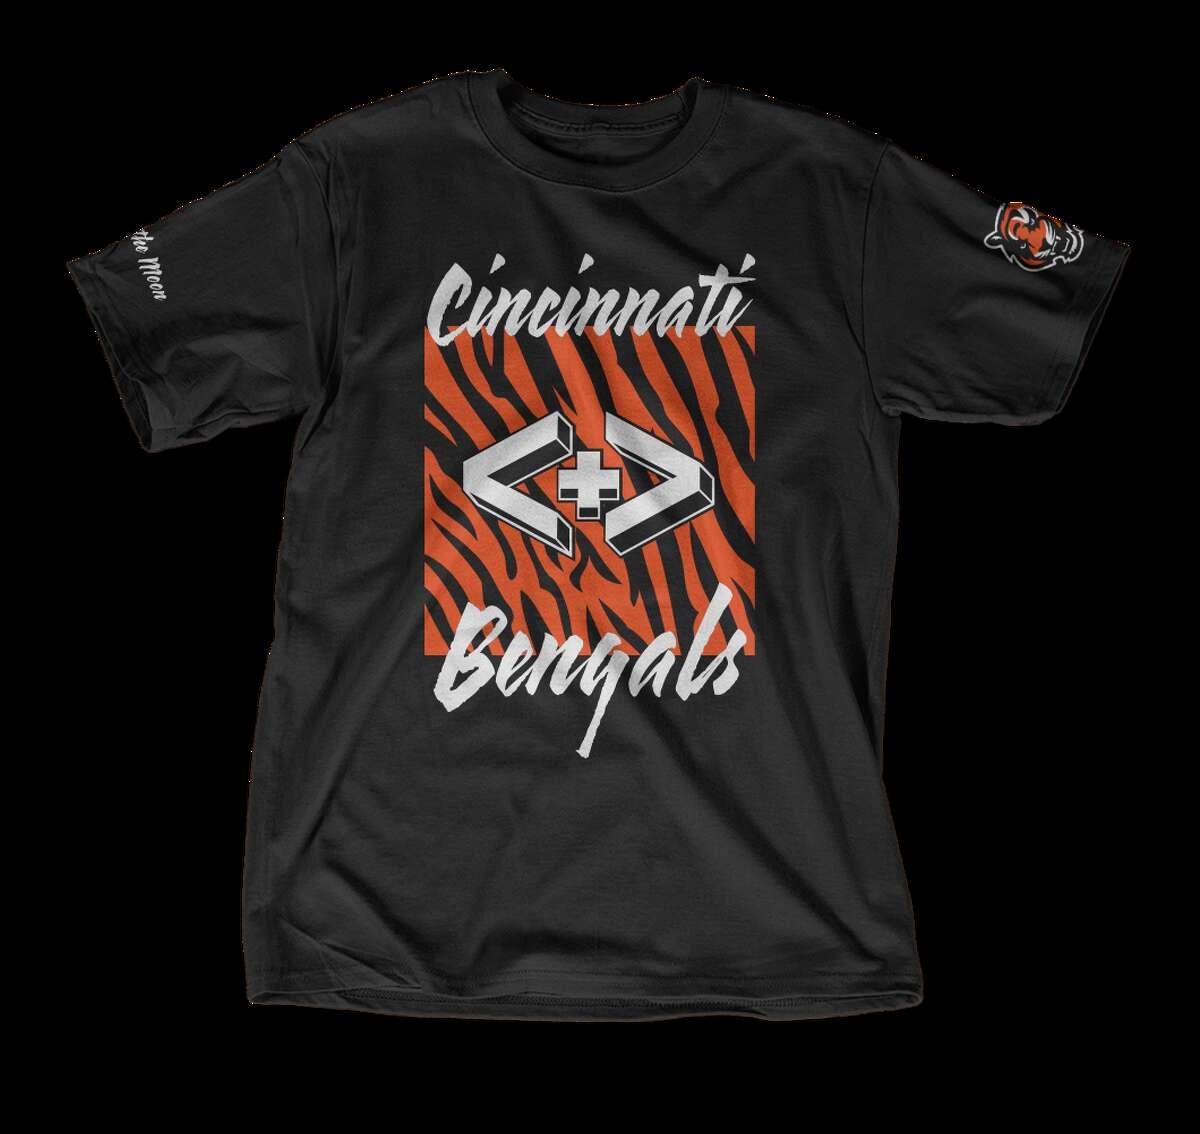 Walk the Moon designed the shirt for the Cincinnati Bengals